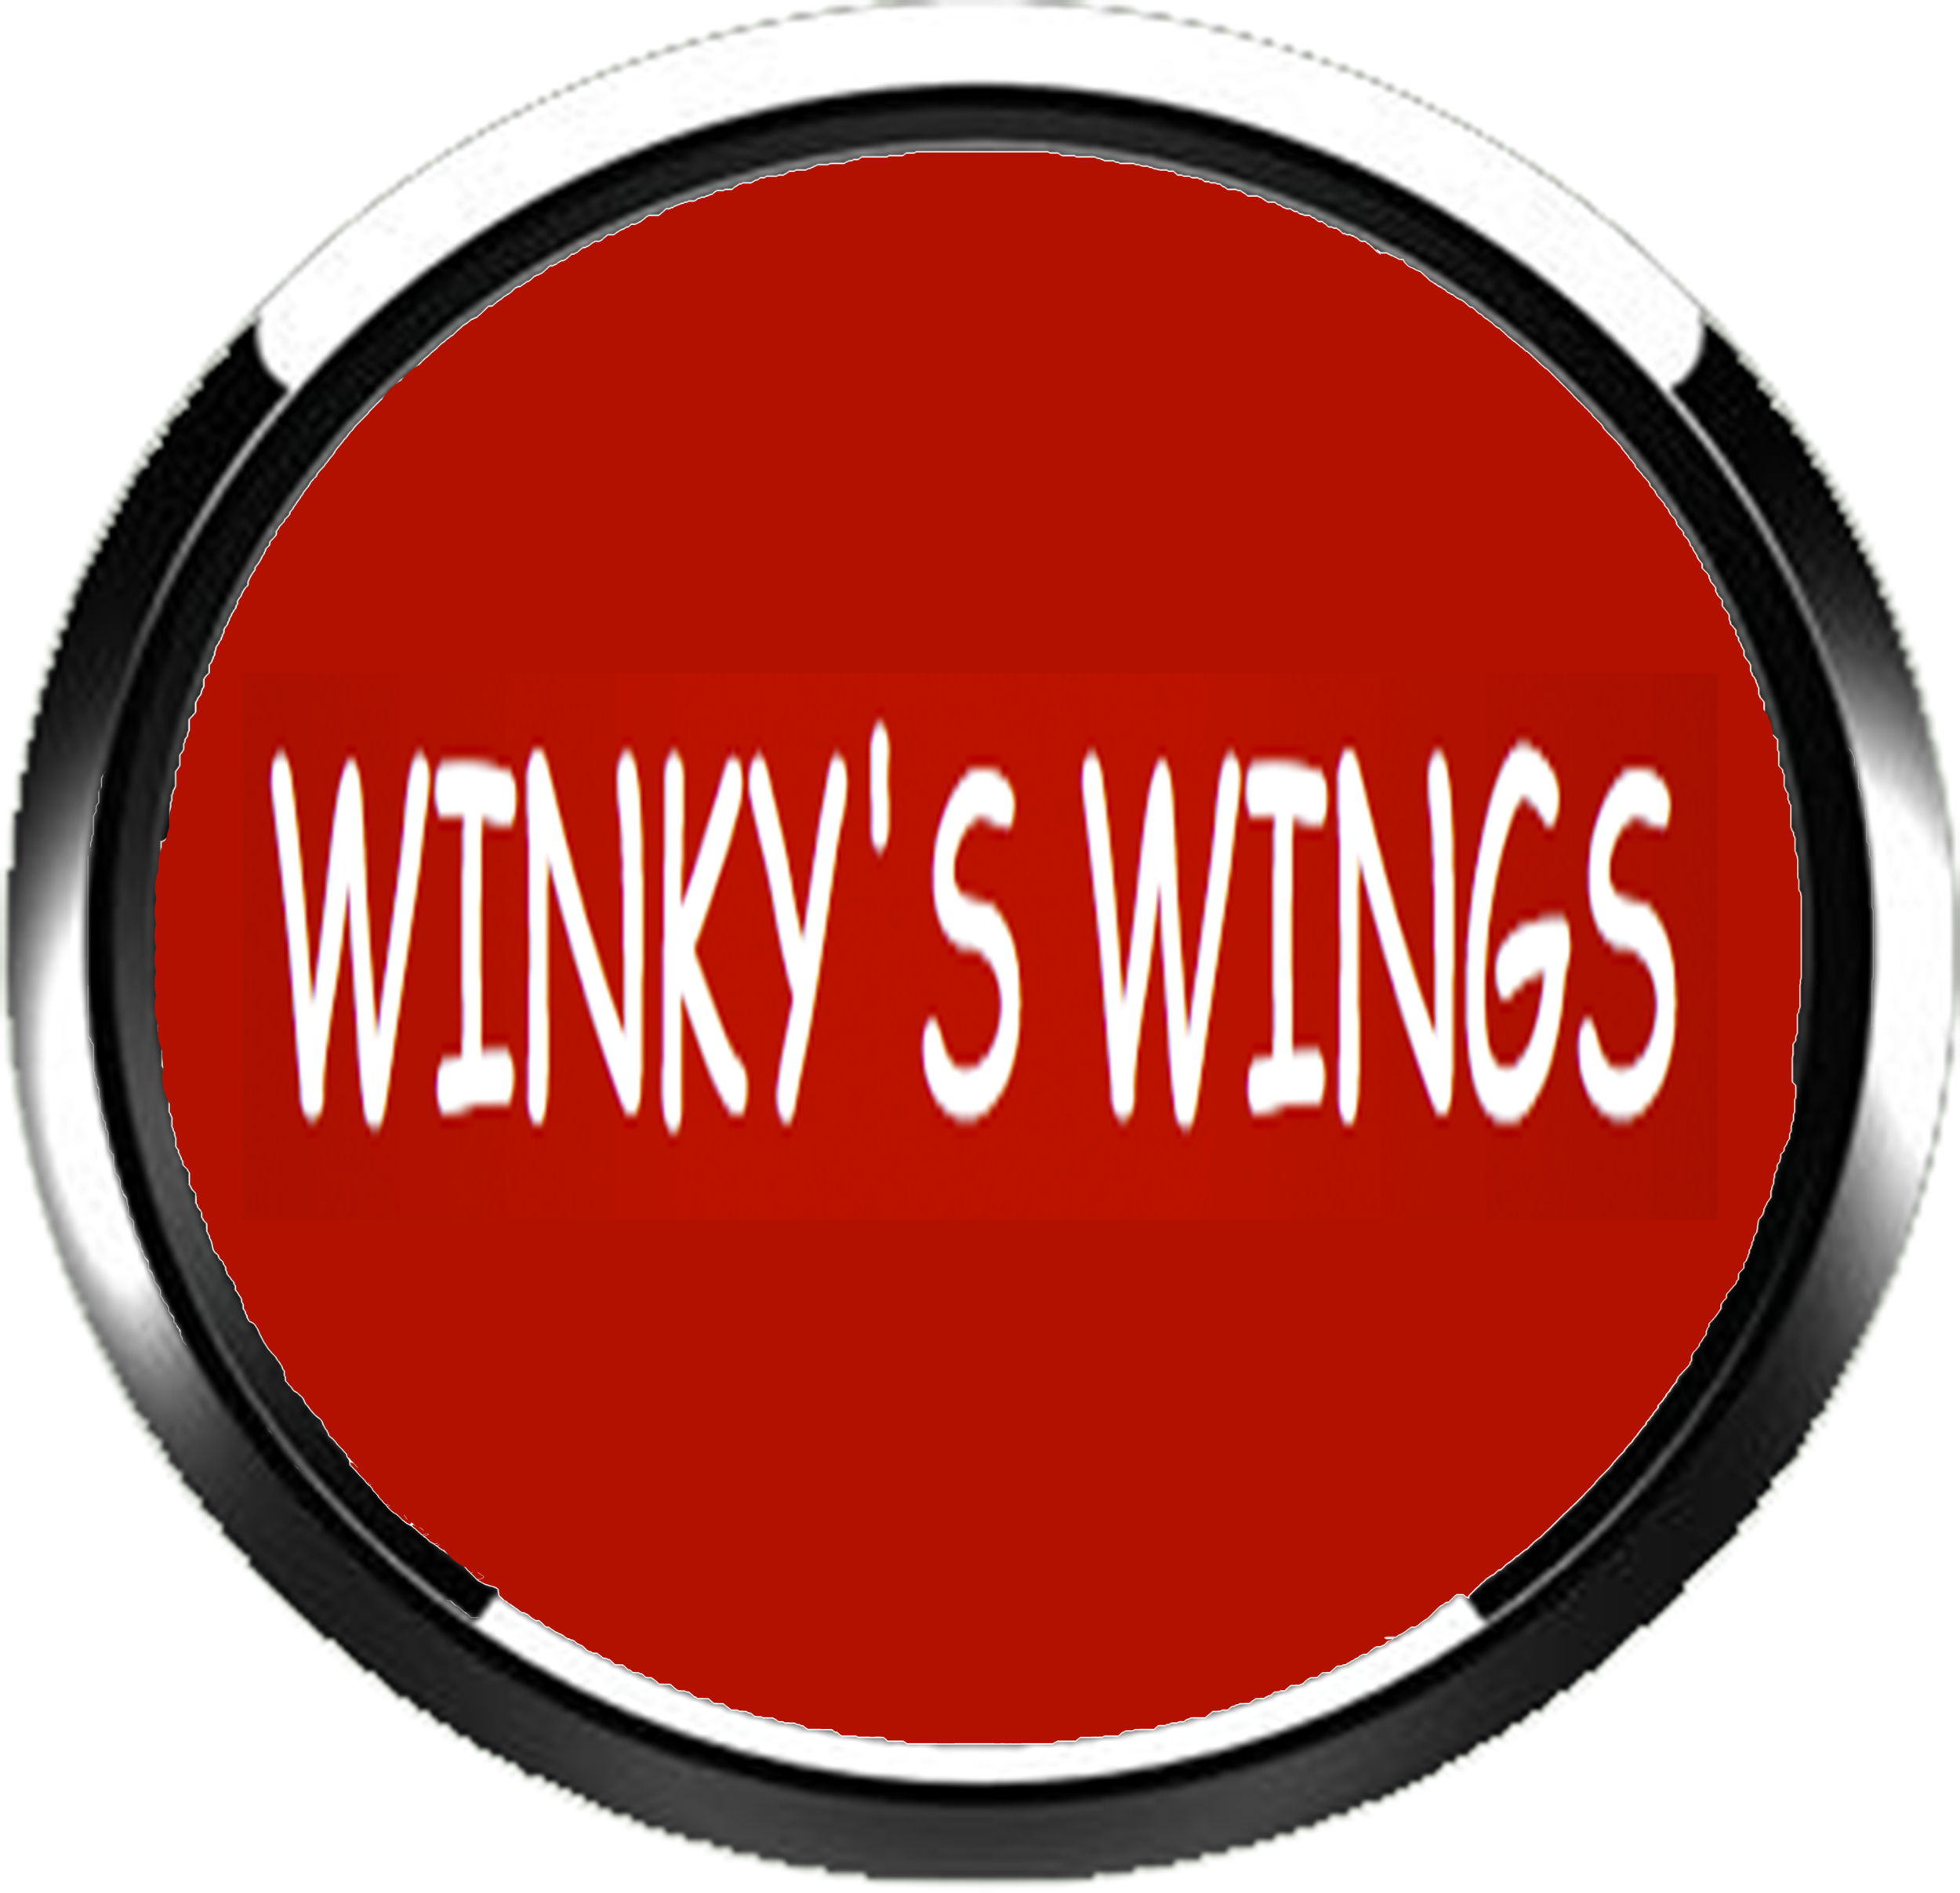 Winky's Wings.png